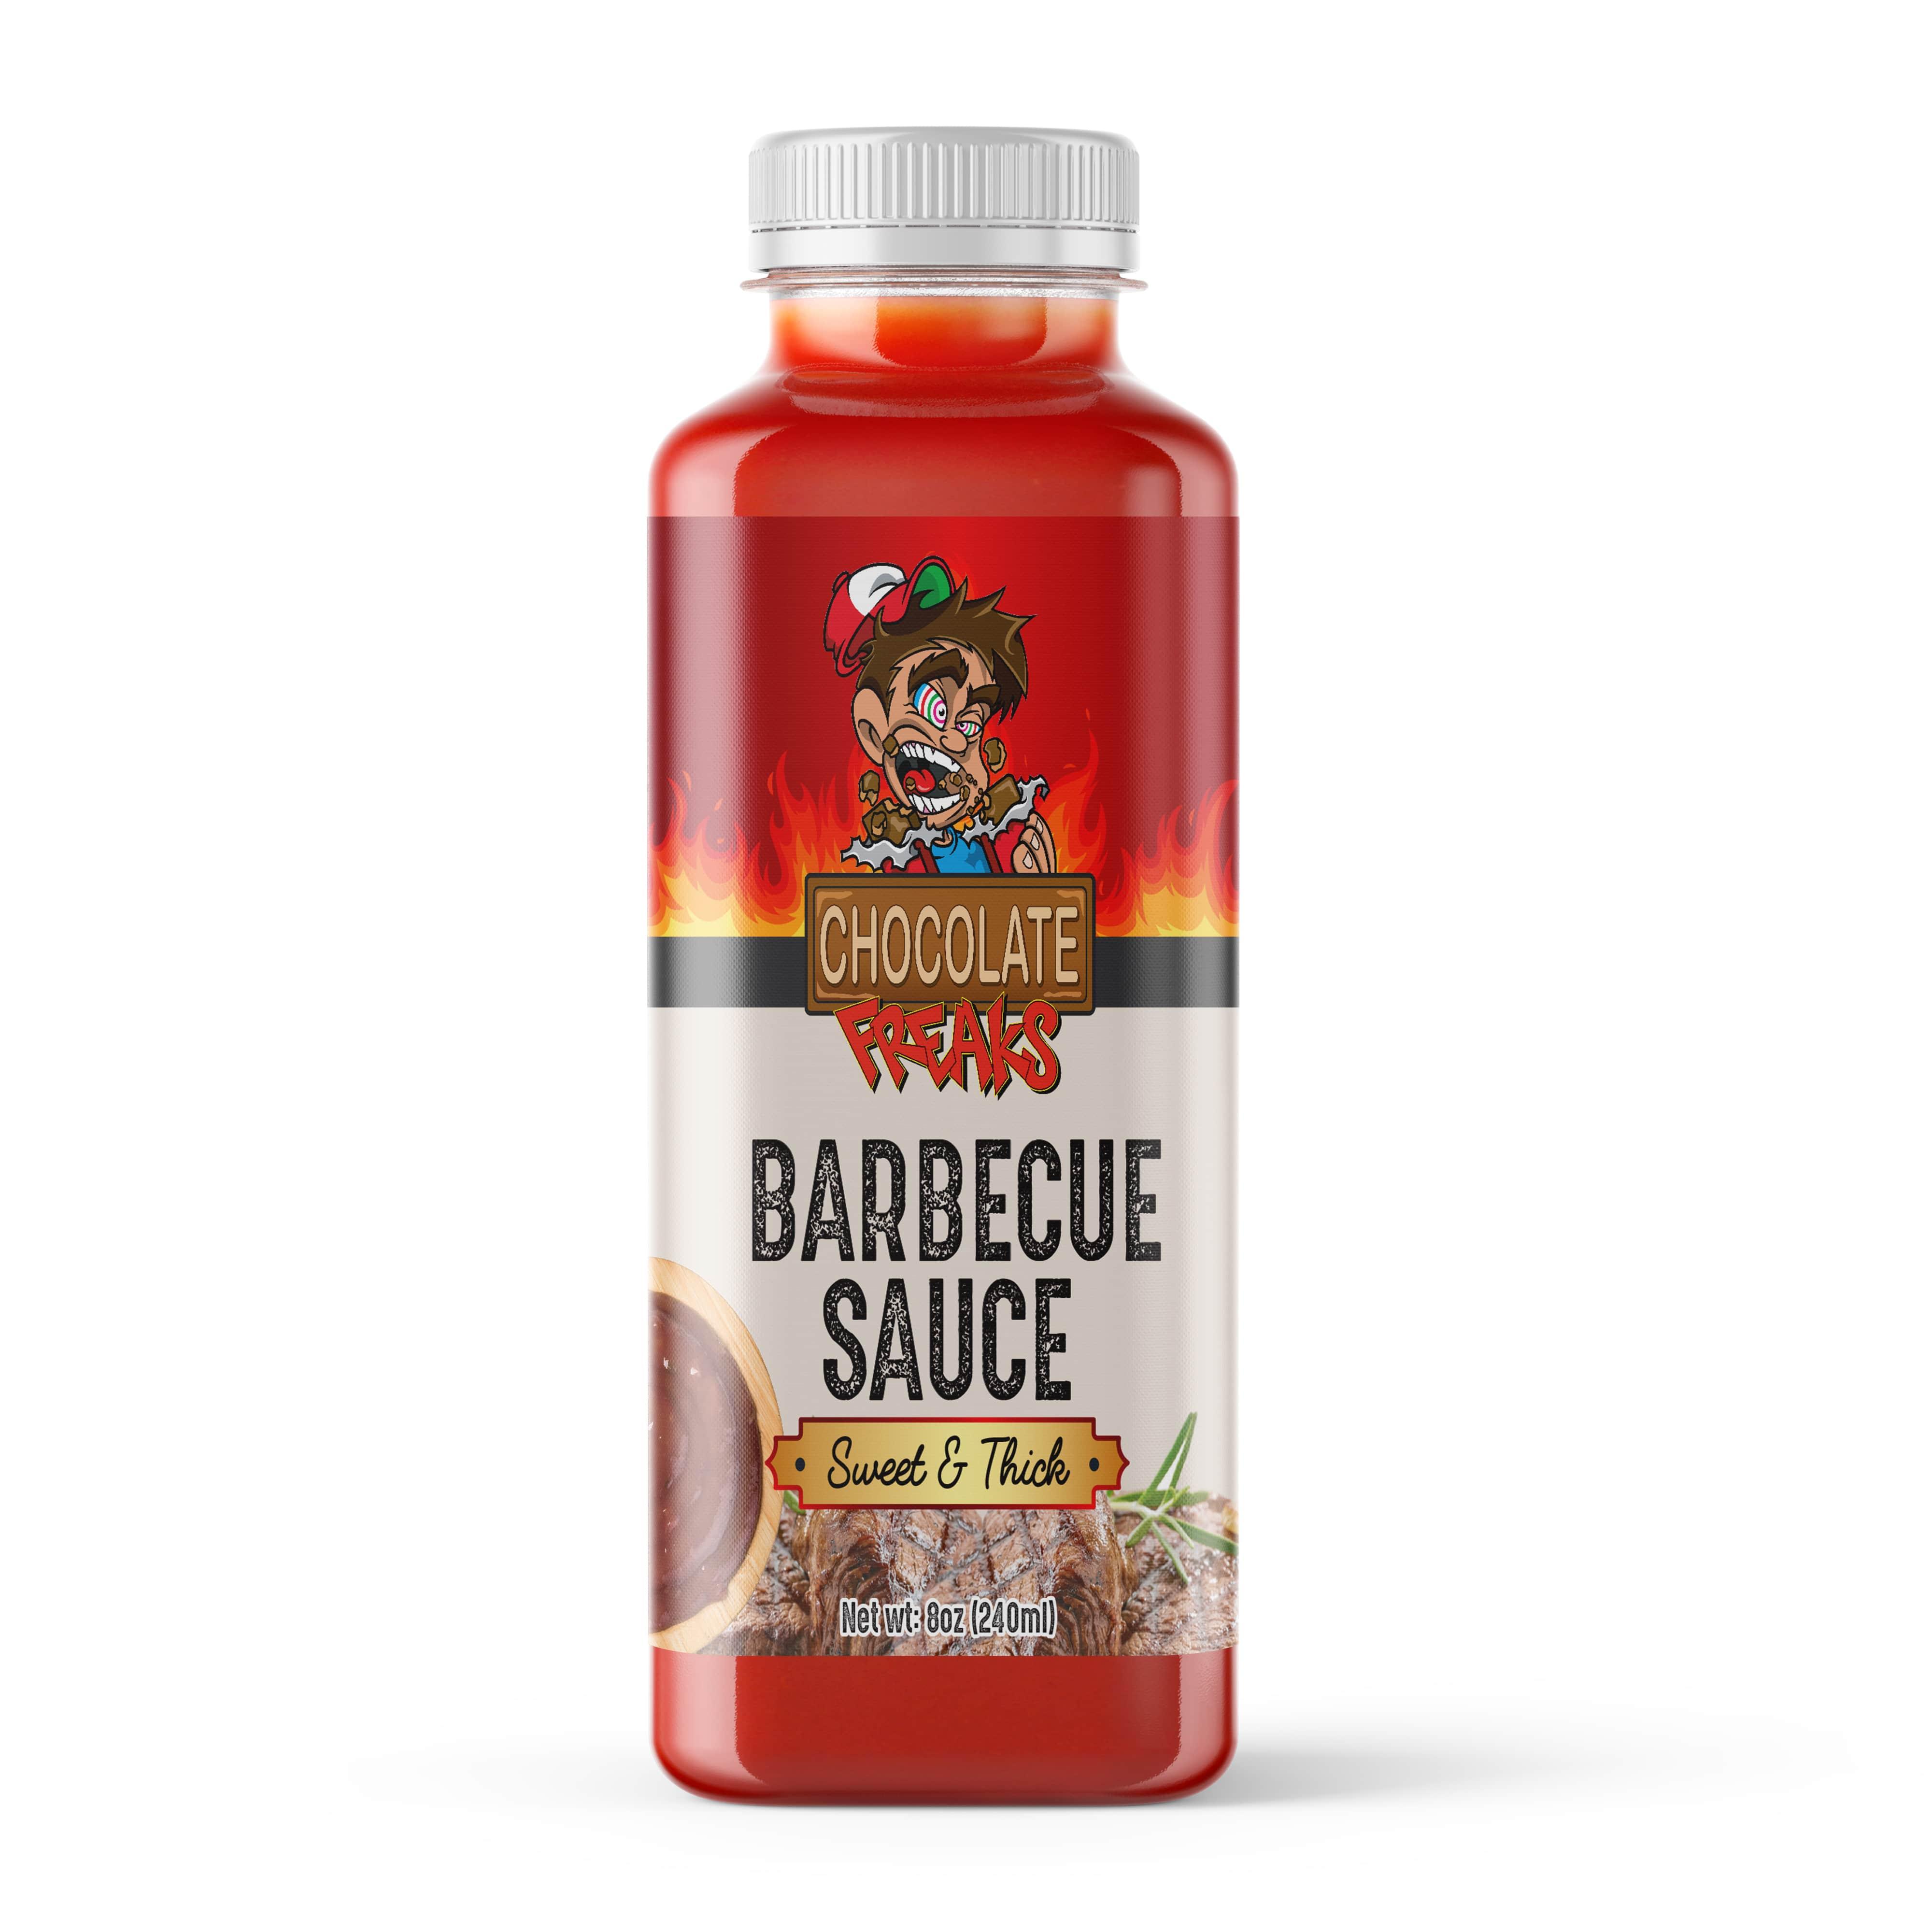 magic barbecue sauce